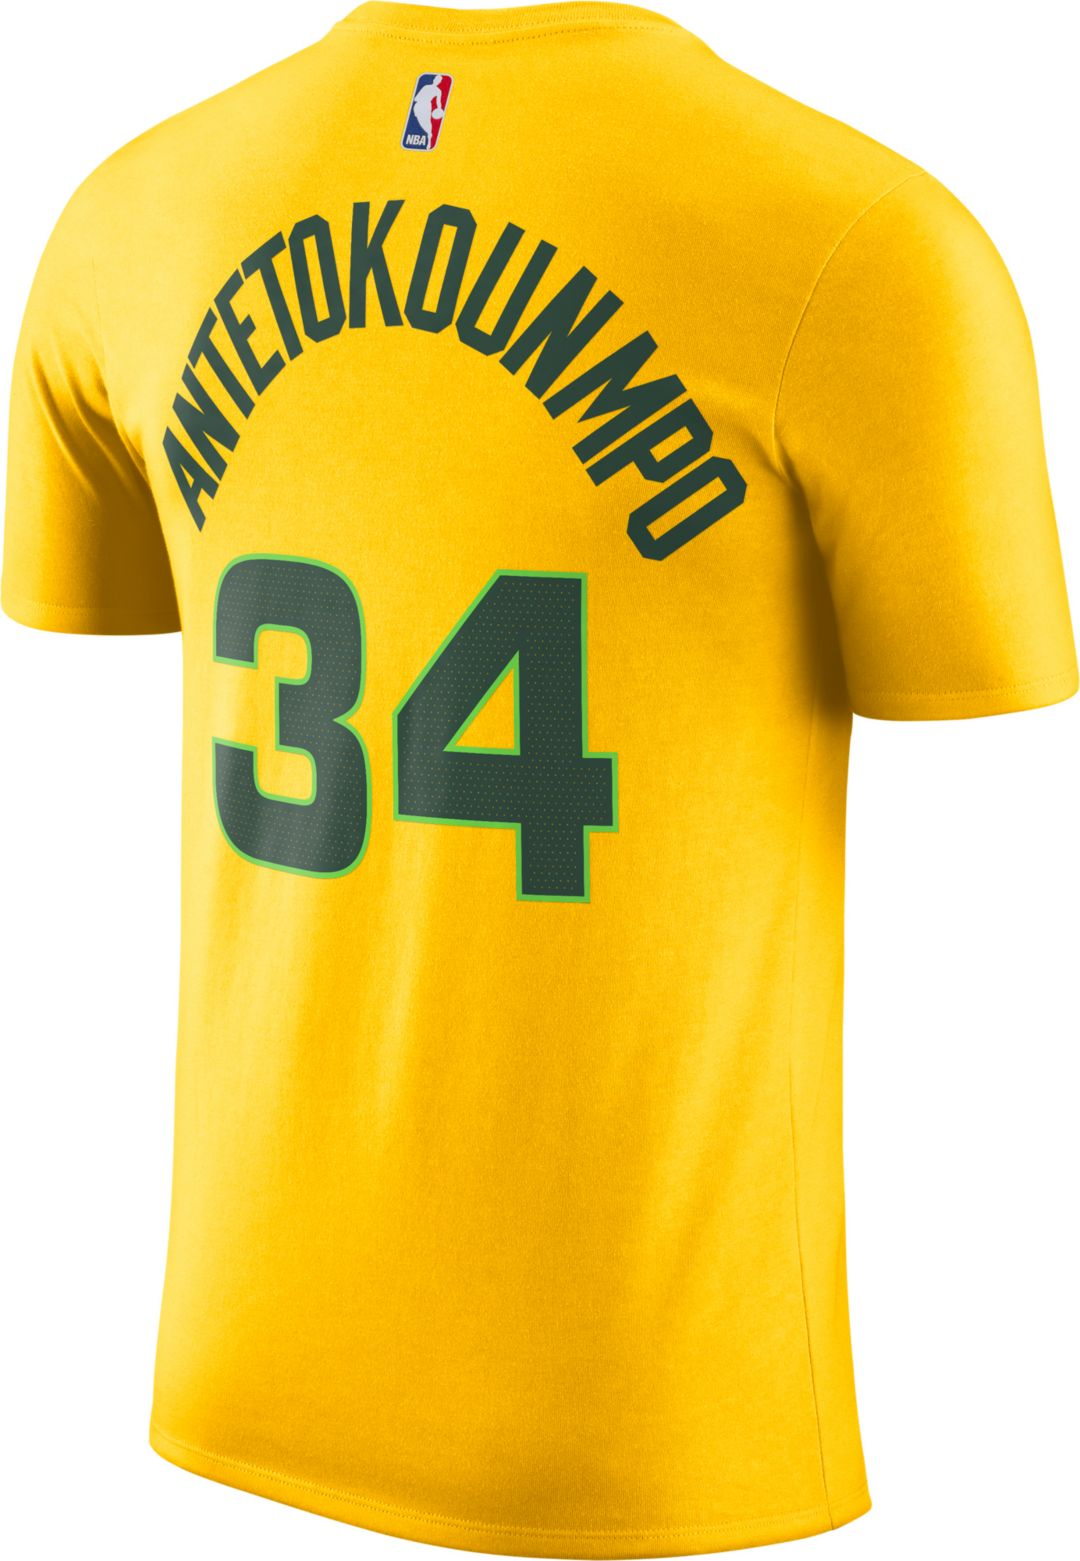 sports shoes 09983 8bfb8 Nike Men's Milwaukee Bucks Giannis Antetokounmpo Dri-FIT City Edition  T-Shirt